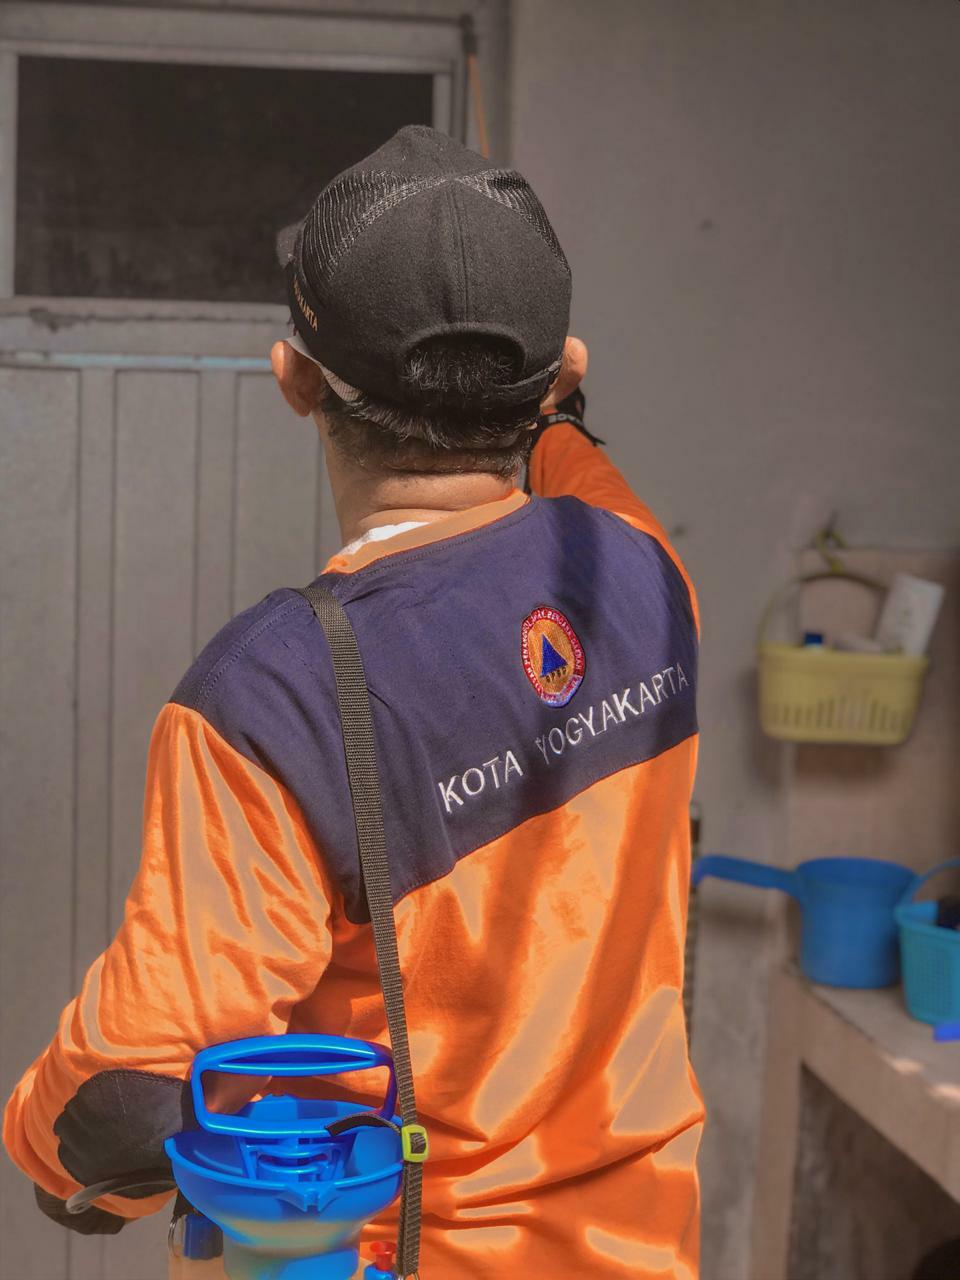 Kerja Bersih-bersih dan Penyemprotan Desinfektan Antisipasi COVID 19 Kel. Baciro, Rabu, 25-03-2020